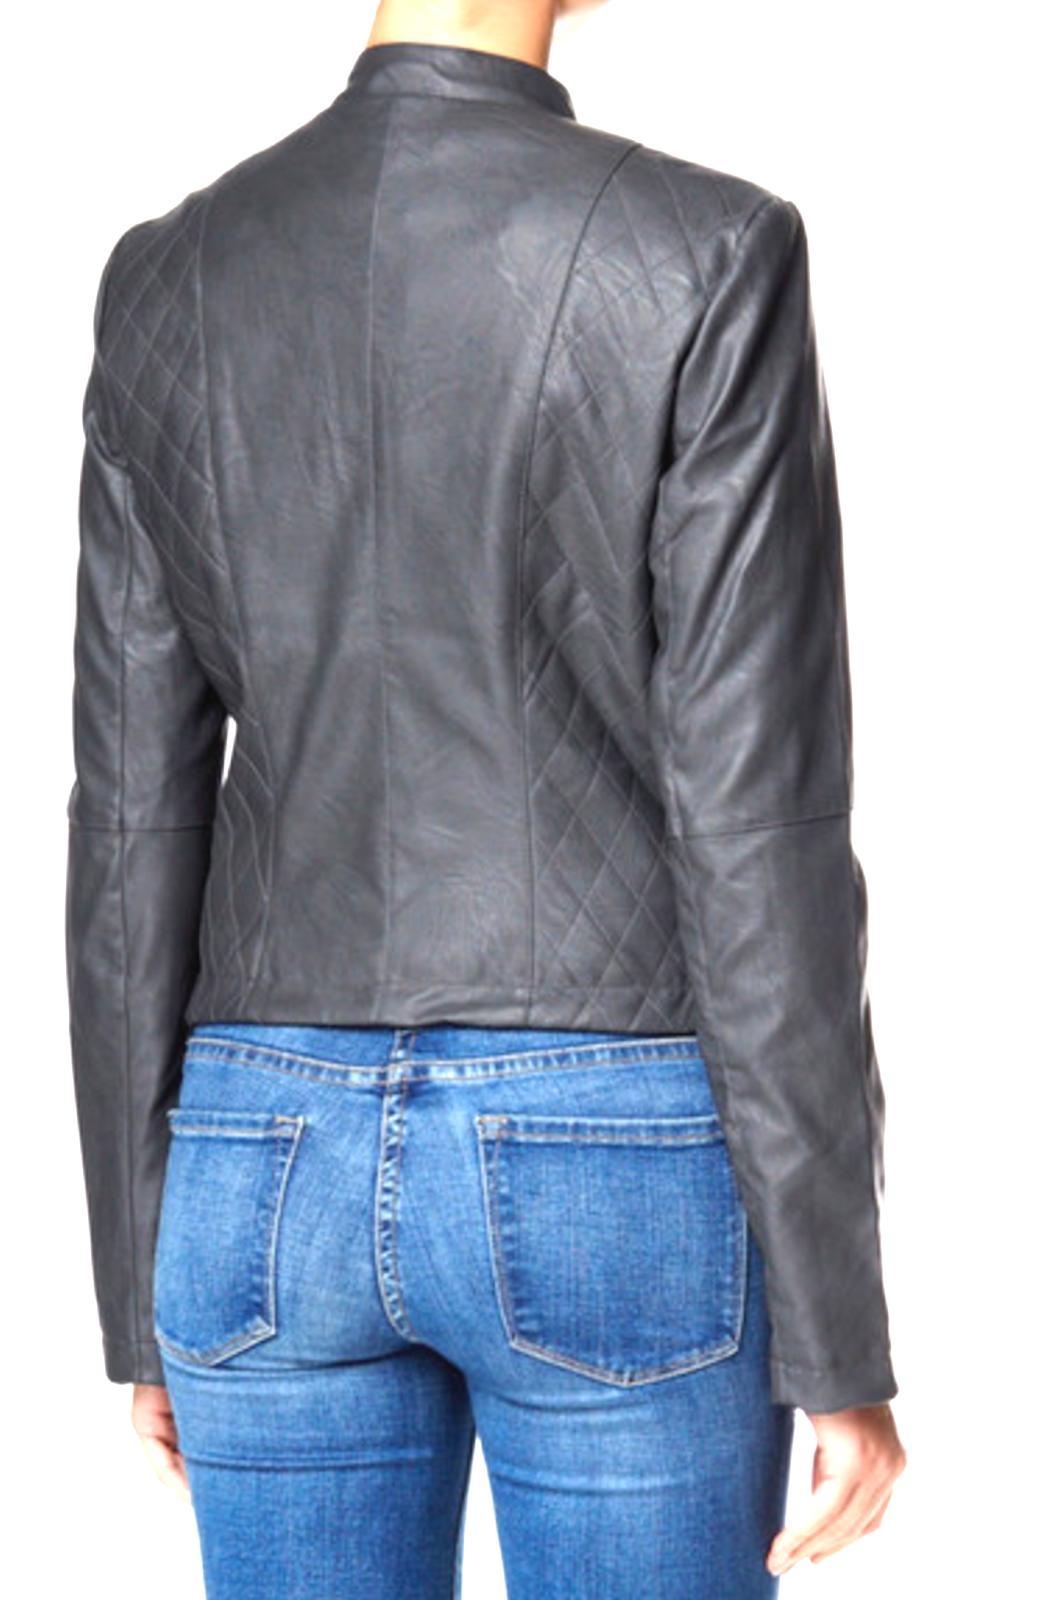 Tart Collections Moto Jacket Steel Women's Med MSRP NWT